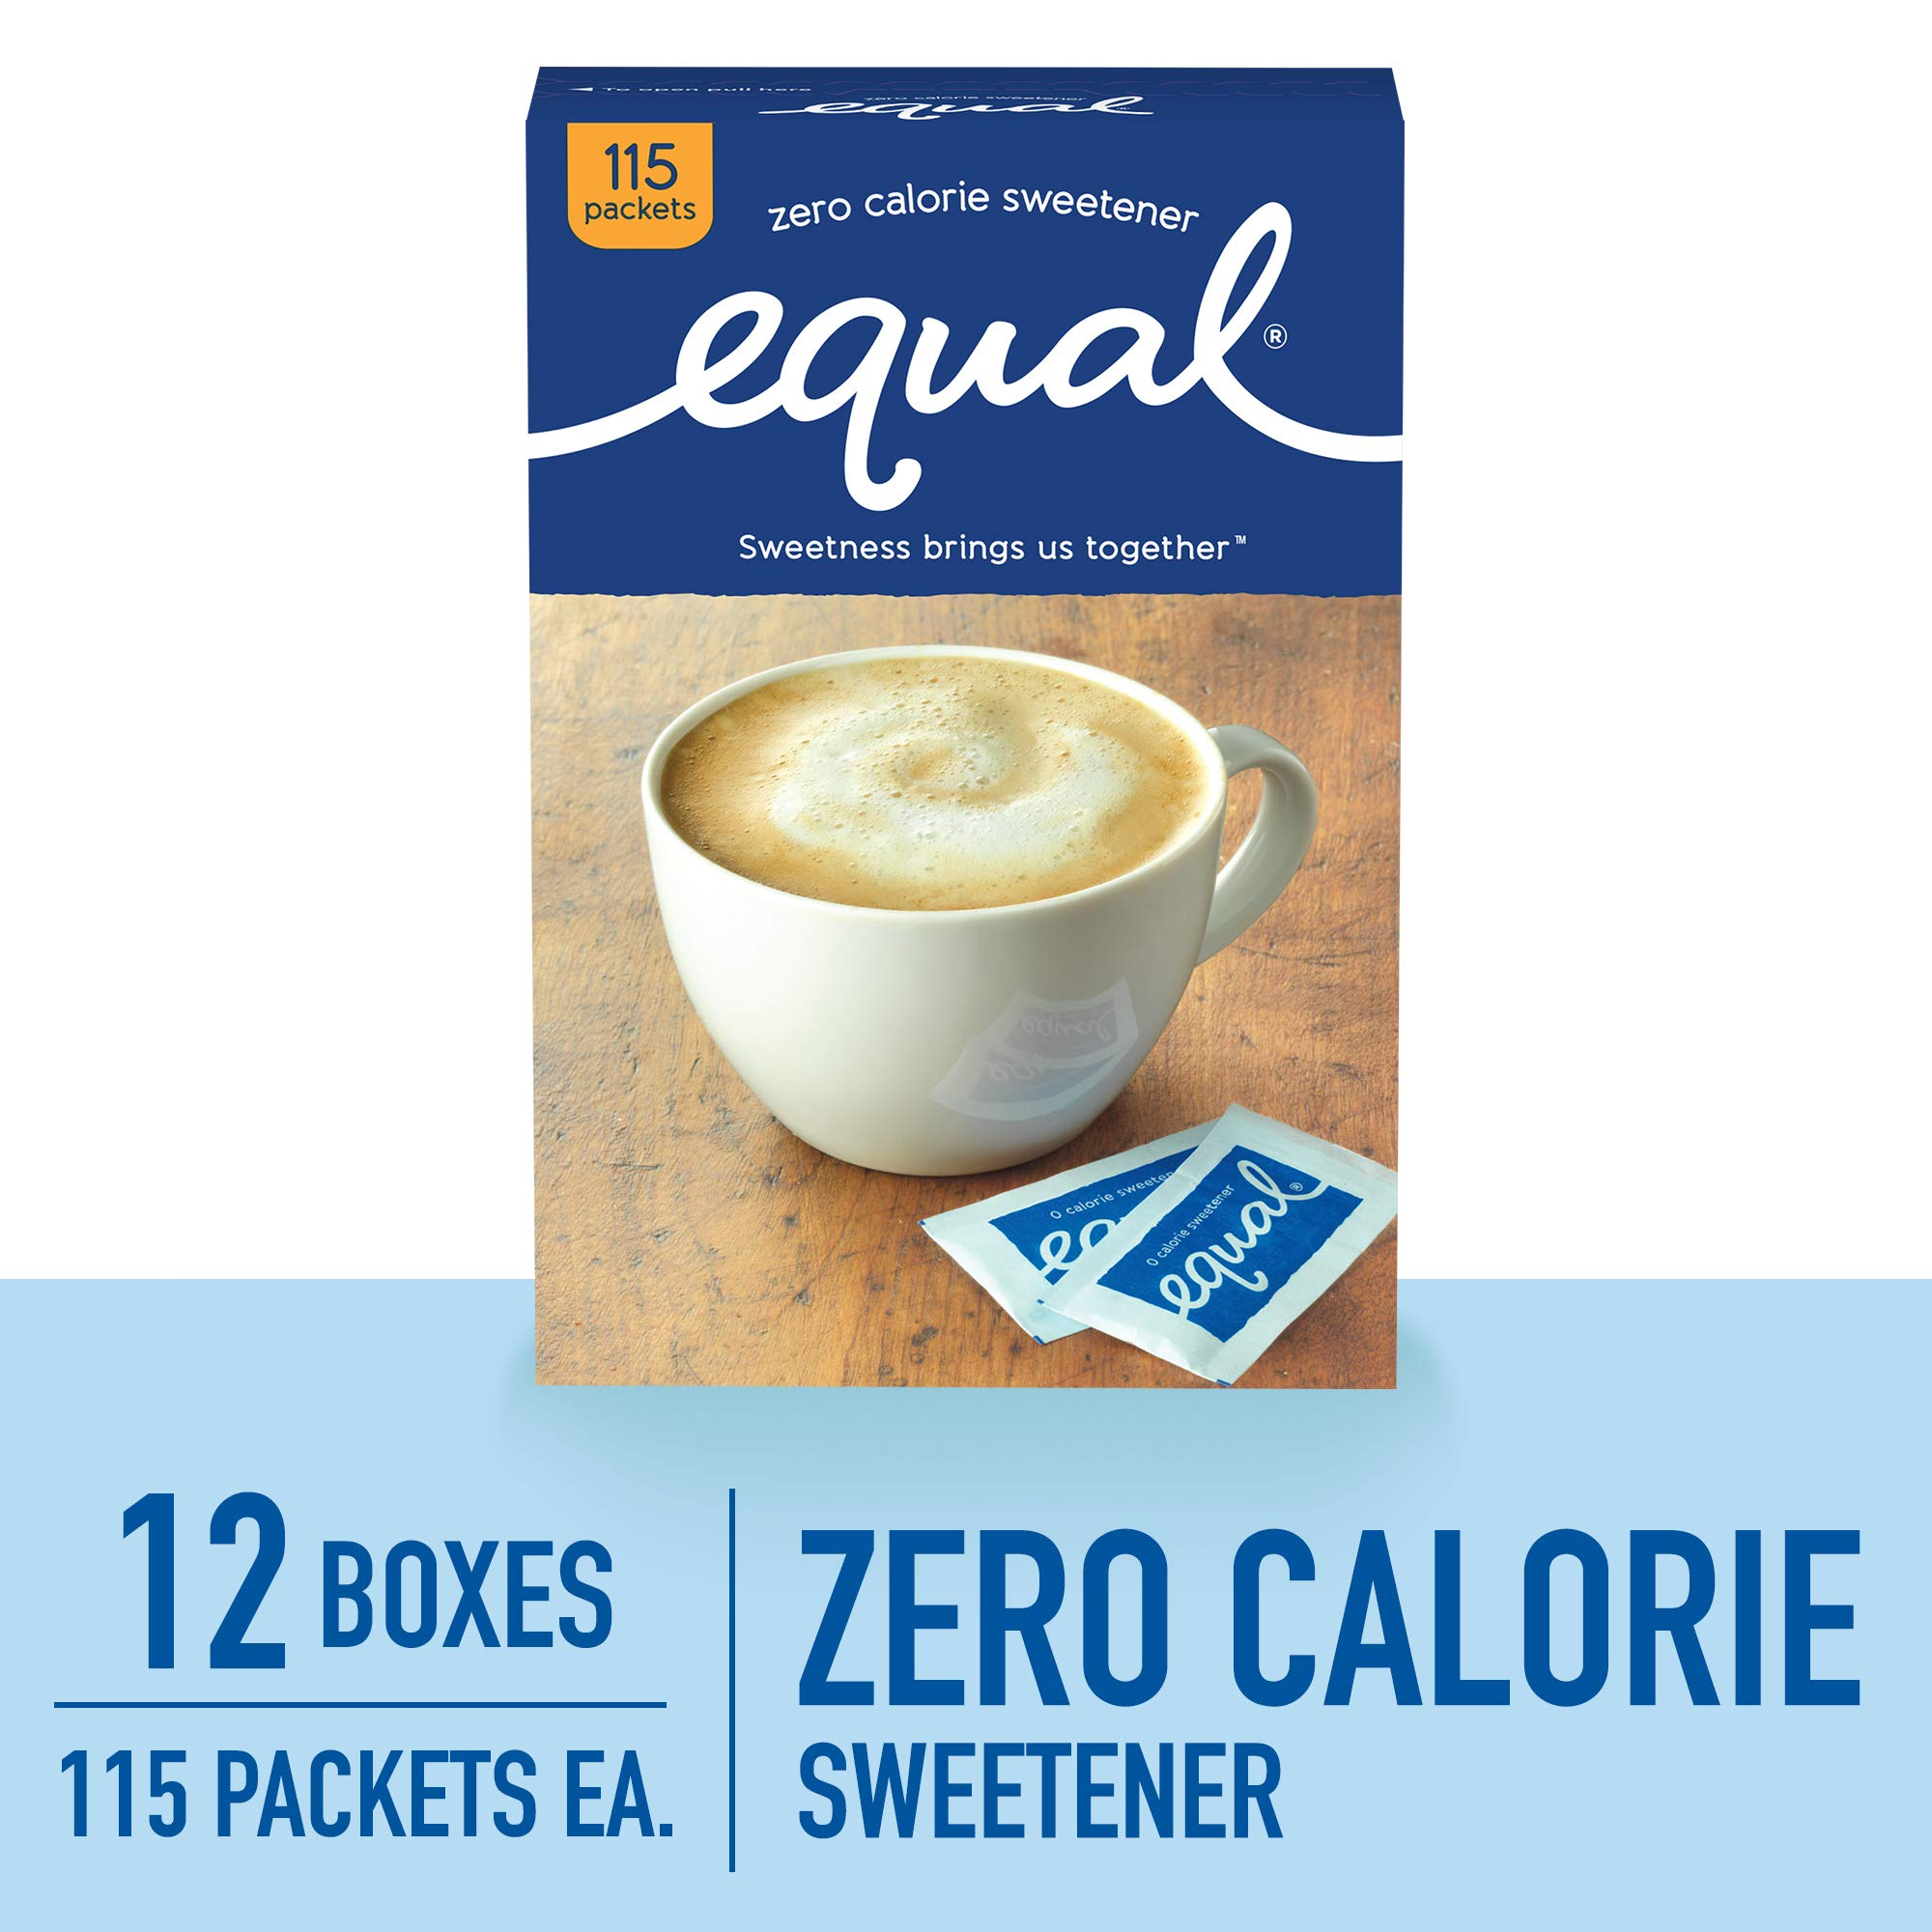 EQUAL 0 Calorie Sweetener, Sugar Substitute, Zero Calorie Sugar Alternative Sweetener Packets, Sugar Alternative, 115 Count (Pack of 12)